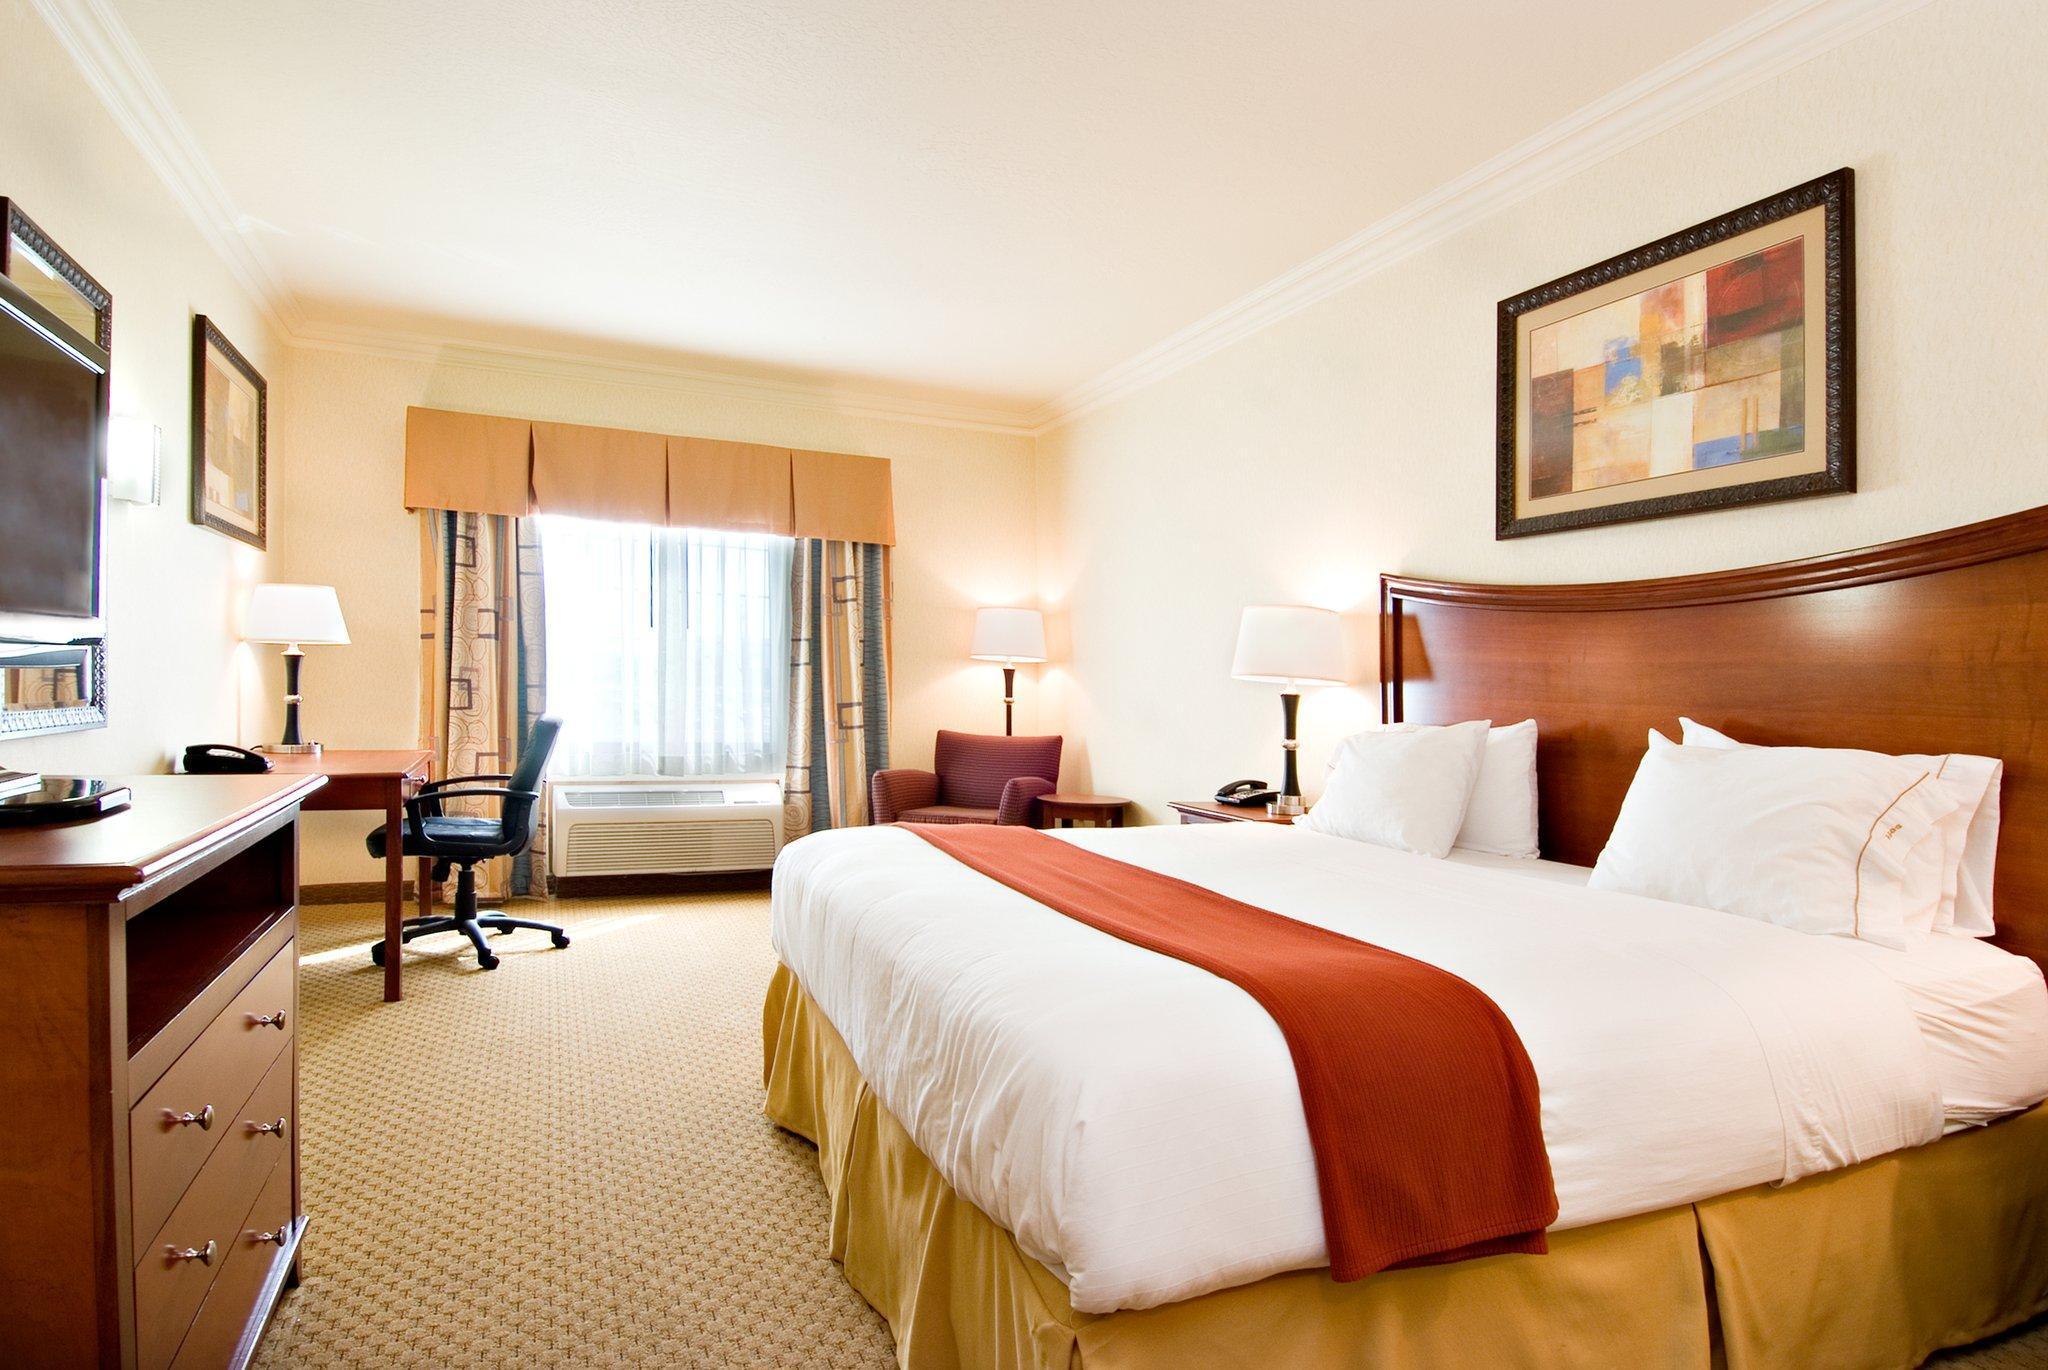 Holiday Inn Express & Suites Klamath Falls Central, Klamath